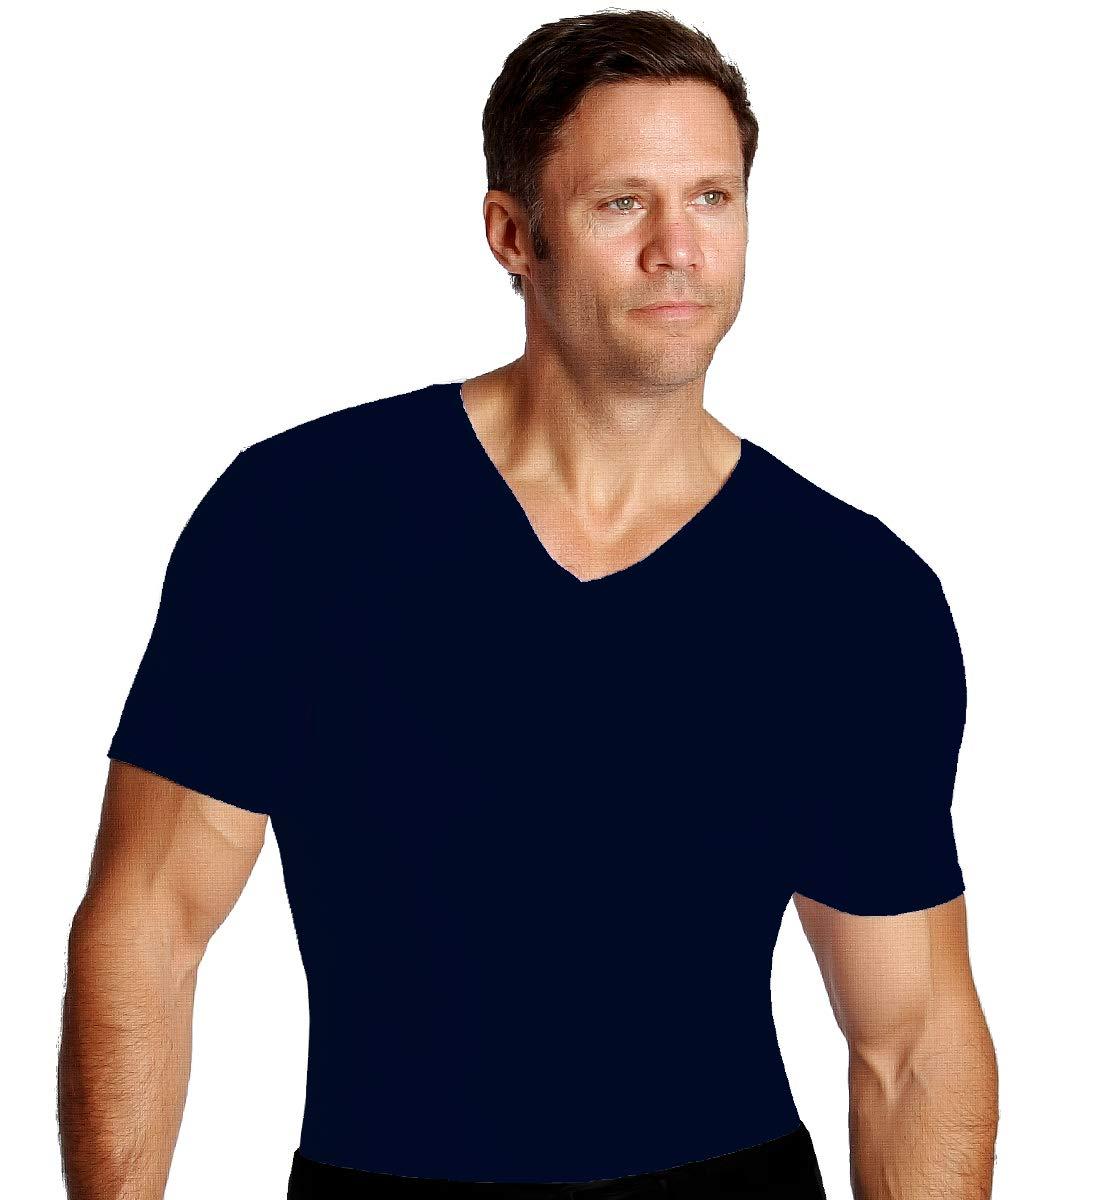 Insta Slim Men's Compression Short Sleeve V Neck Shirt - Slimming Body Shaper Undershirt